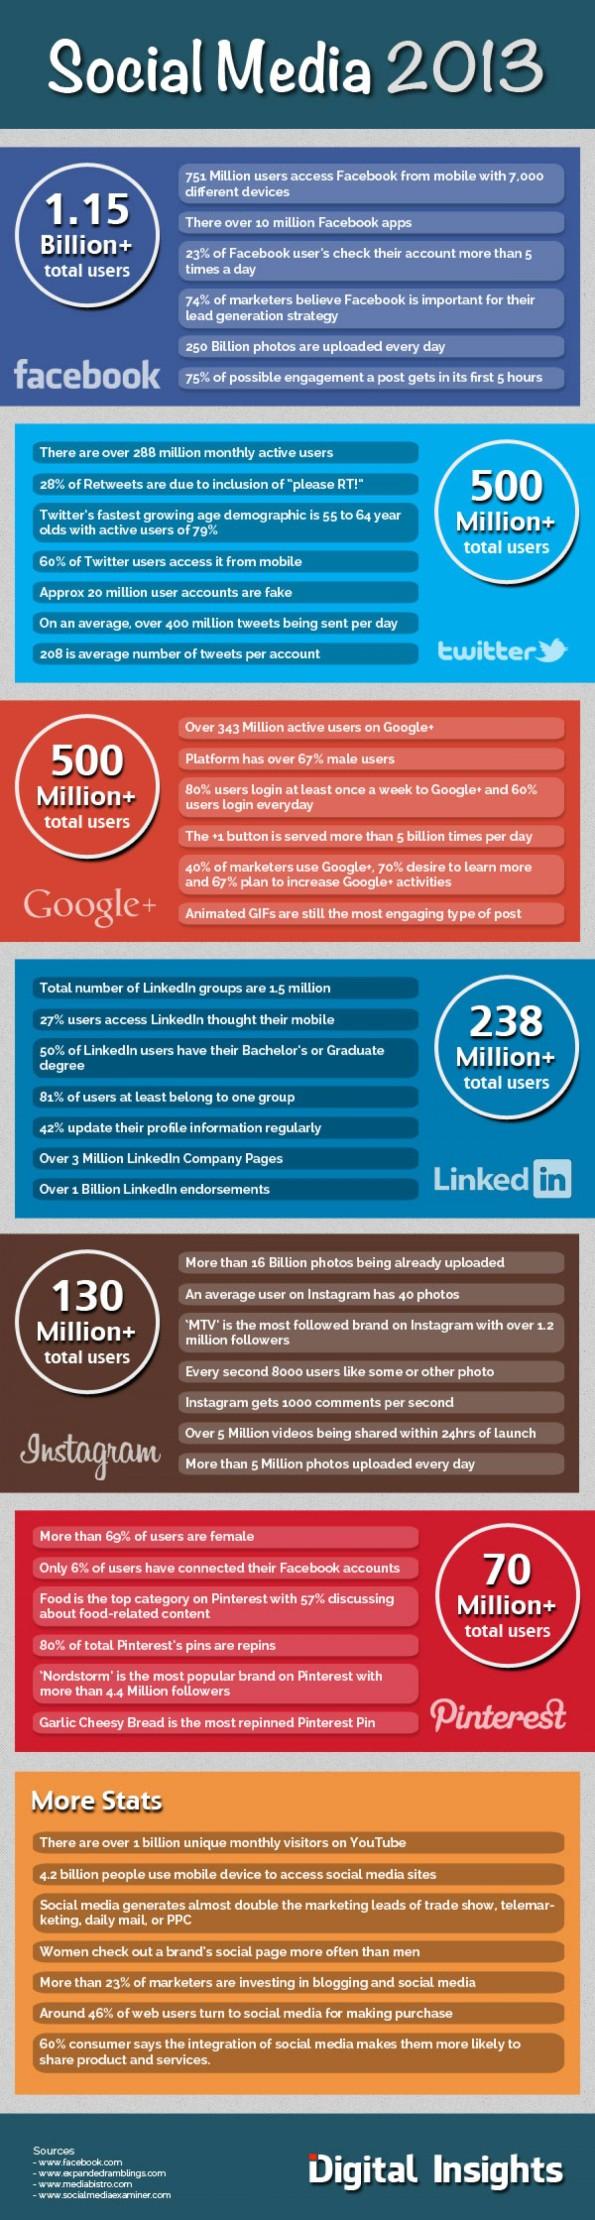 Social-Media-Estadisticas-del-2013